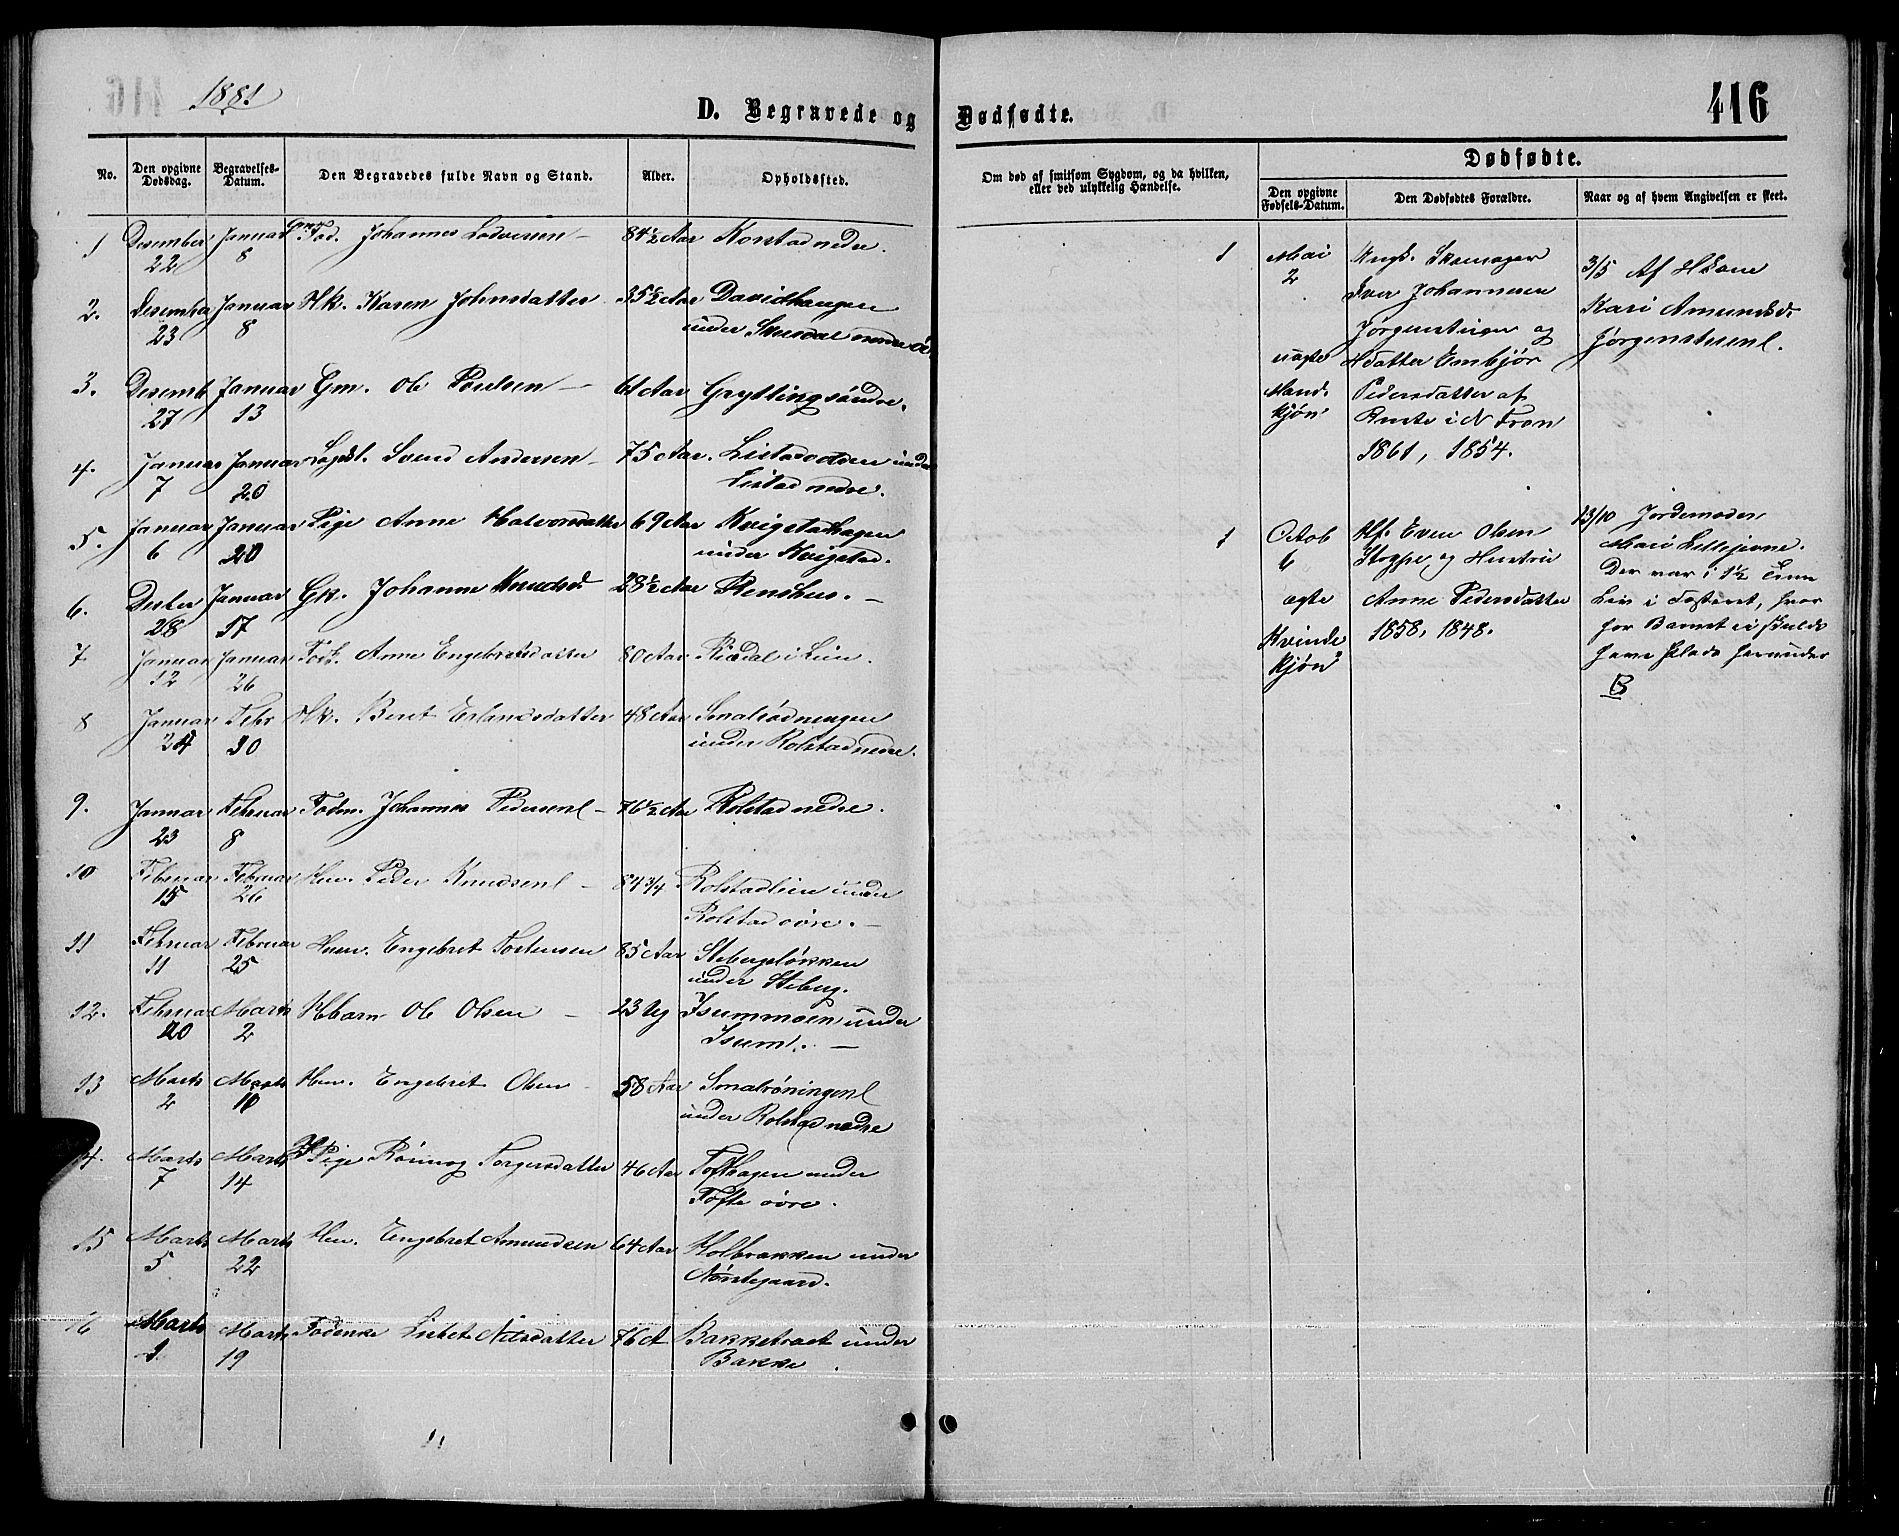 SAH, Sør-Fron prestekontor, H/Ha/Hab/L0002: Klokkerbok nr. 2, 1864-1883, s. 416